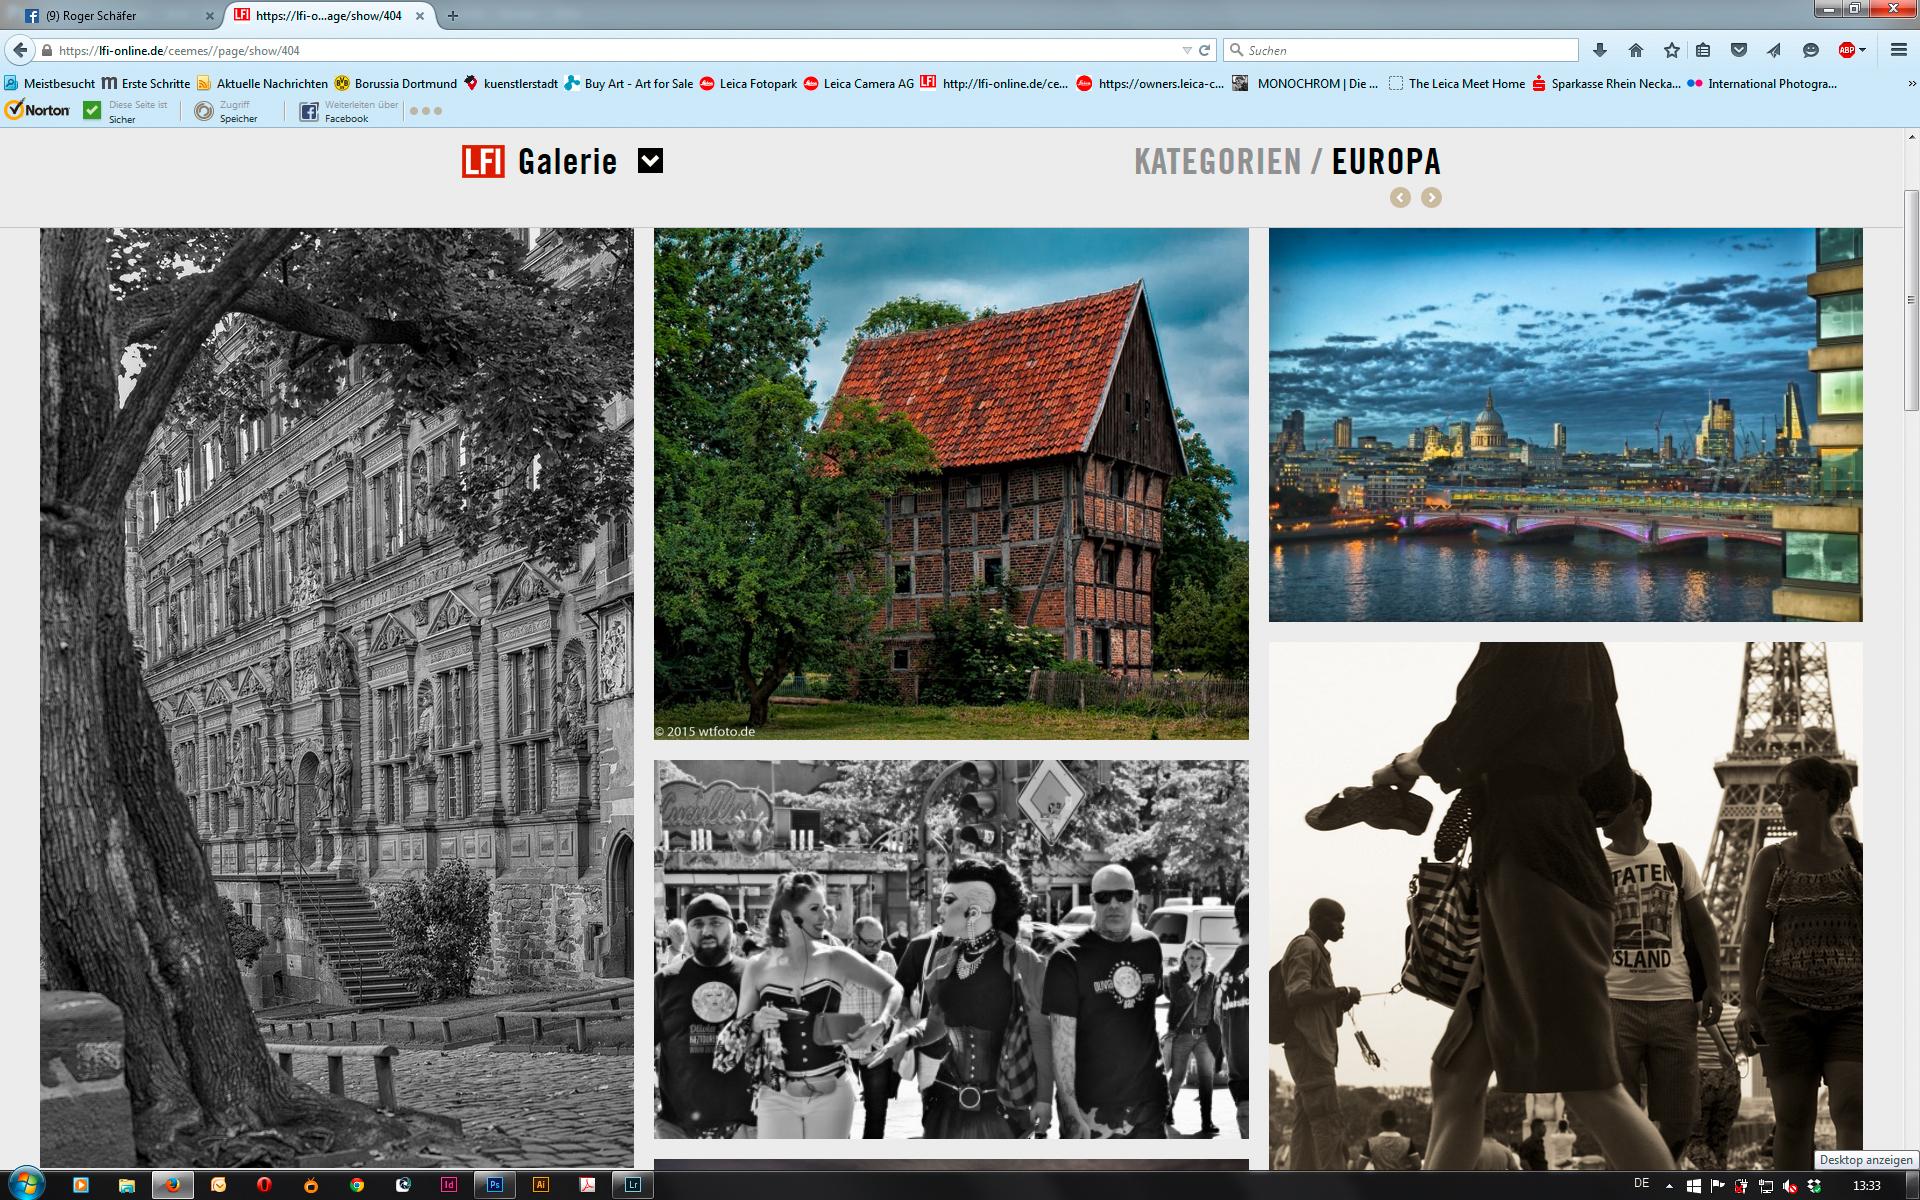 LeicaLFI_Europa by .